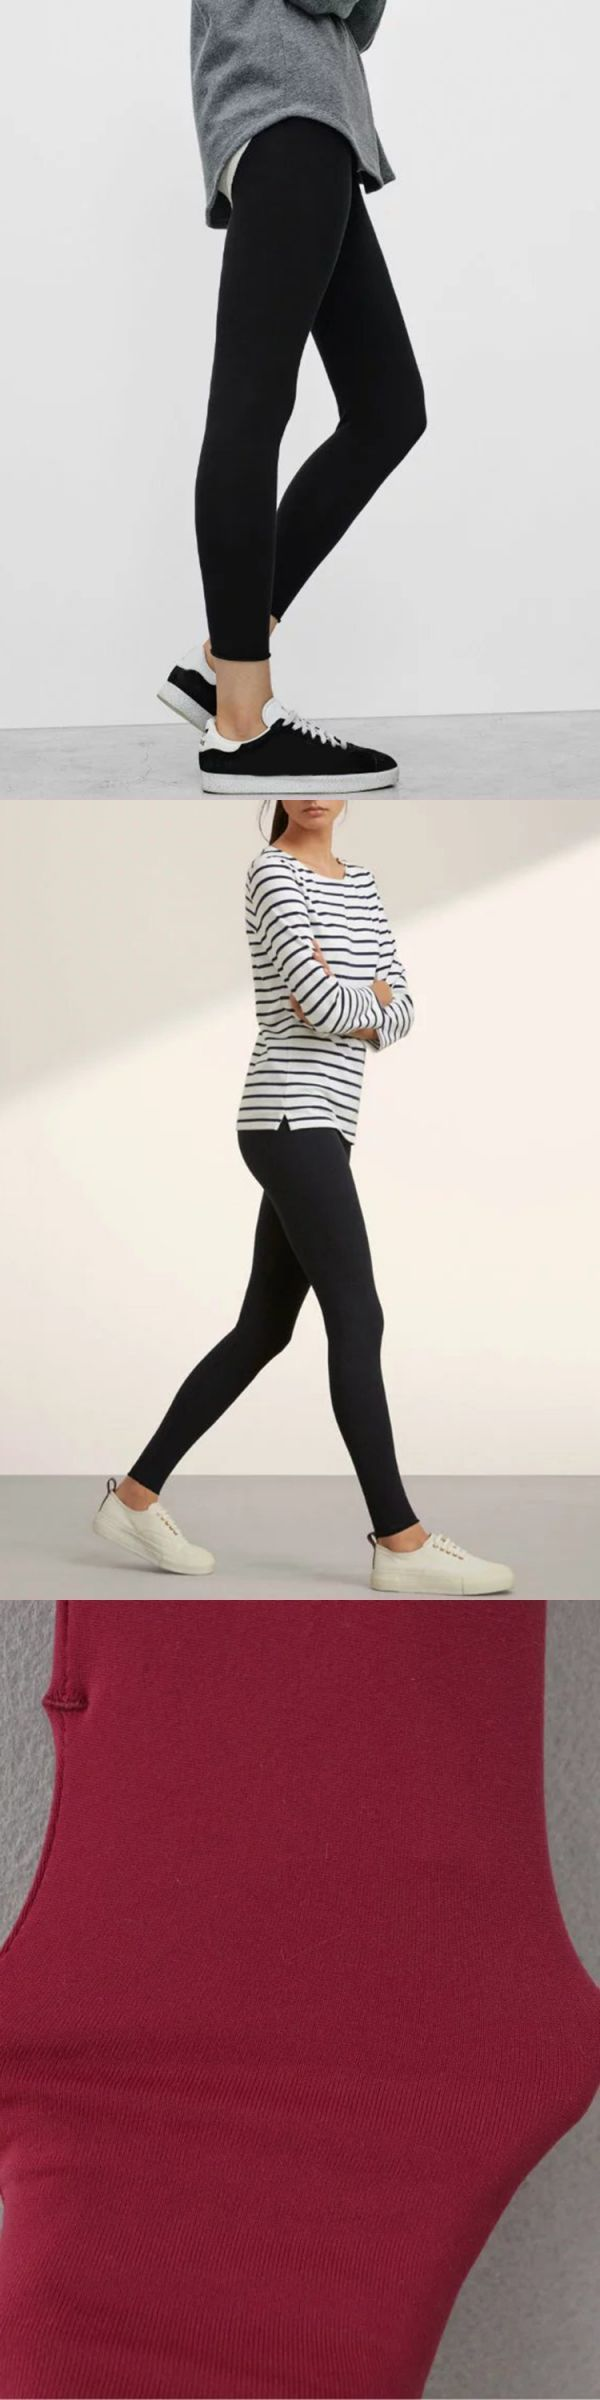 Slim women elastic yoga sport fitting leggings mamp;s leggings ladies #leggings #los #angeles #leggings #n #kurti #leggings #petite #leggings #queen #maxi #skirt